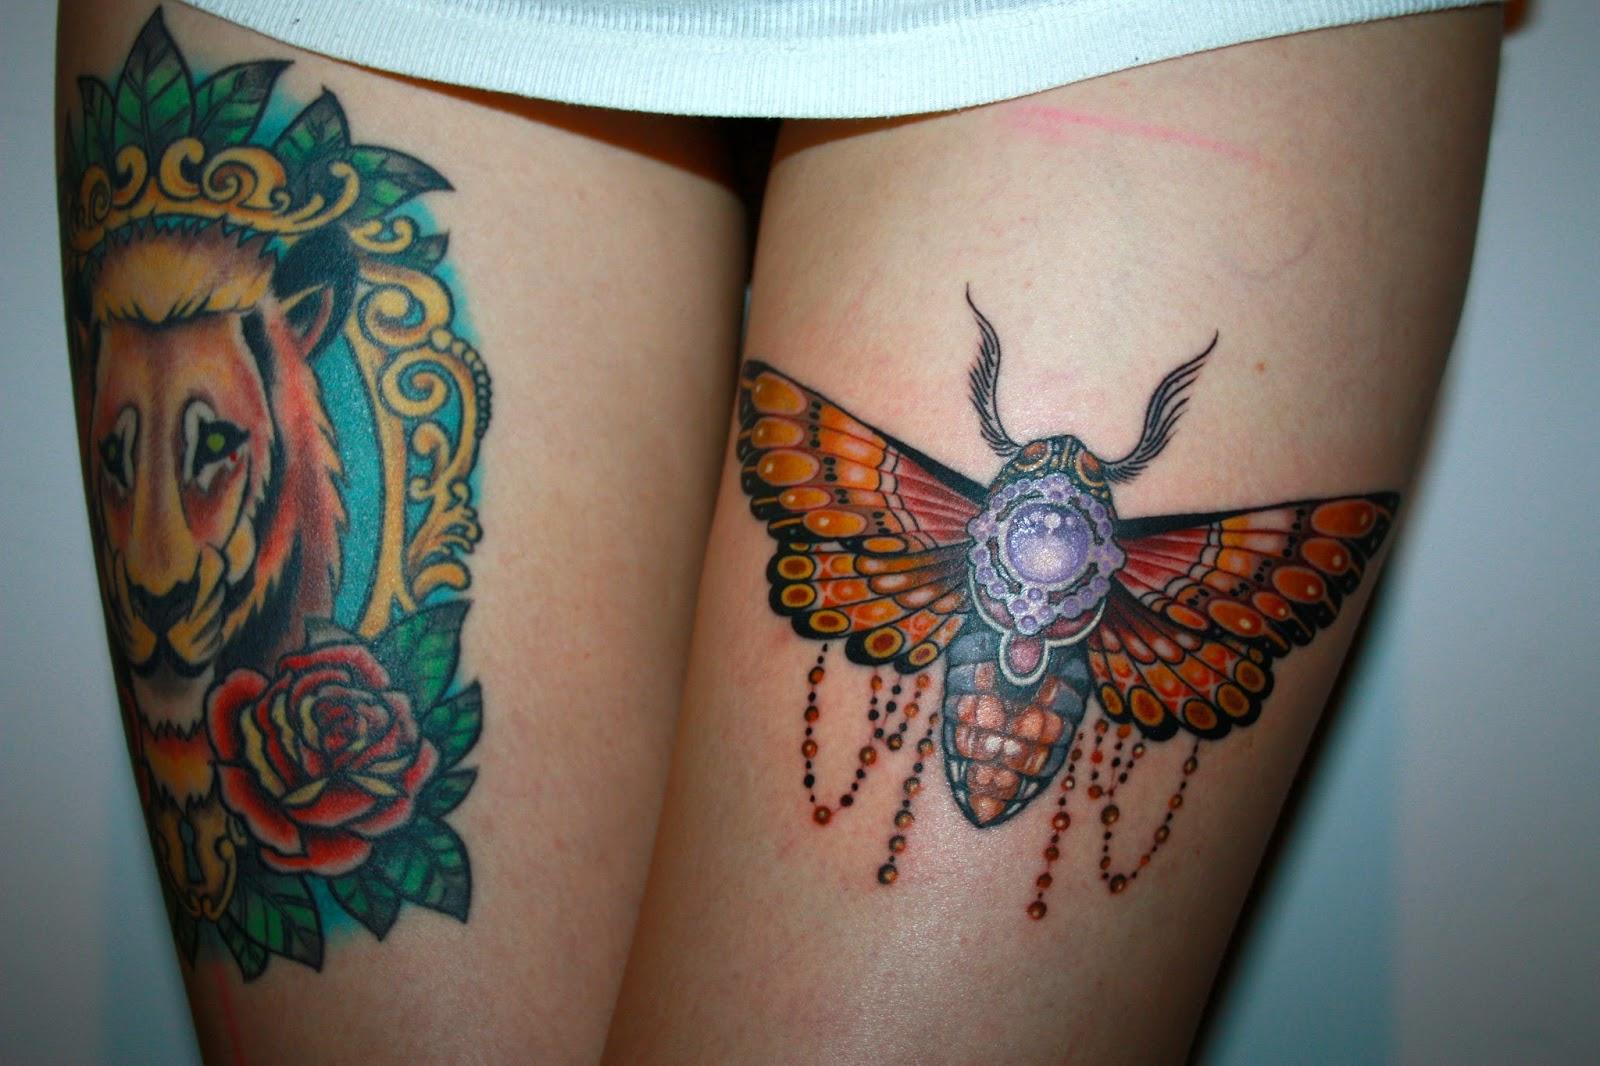 Berlin Allstyle Tattoo Moth Old School inked girls Luis Orellana